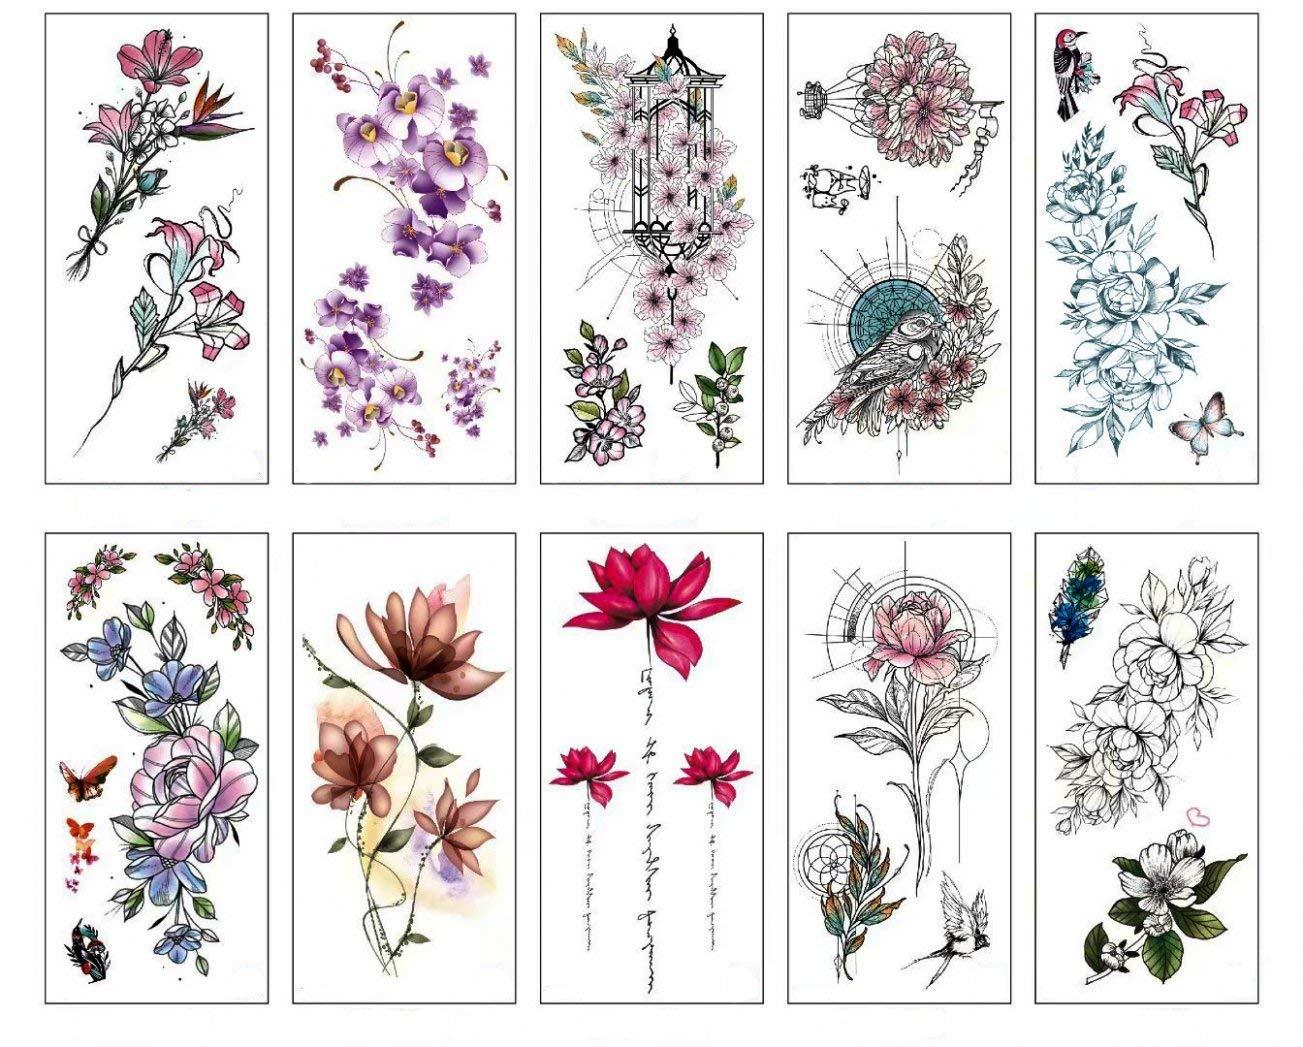 PAMO Flower Fake - Tatuajes temporales con flores de cerezo y flor ...